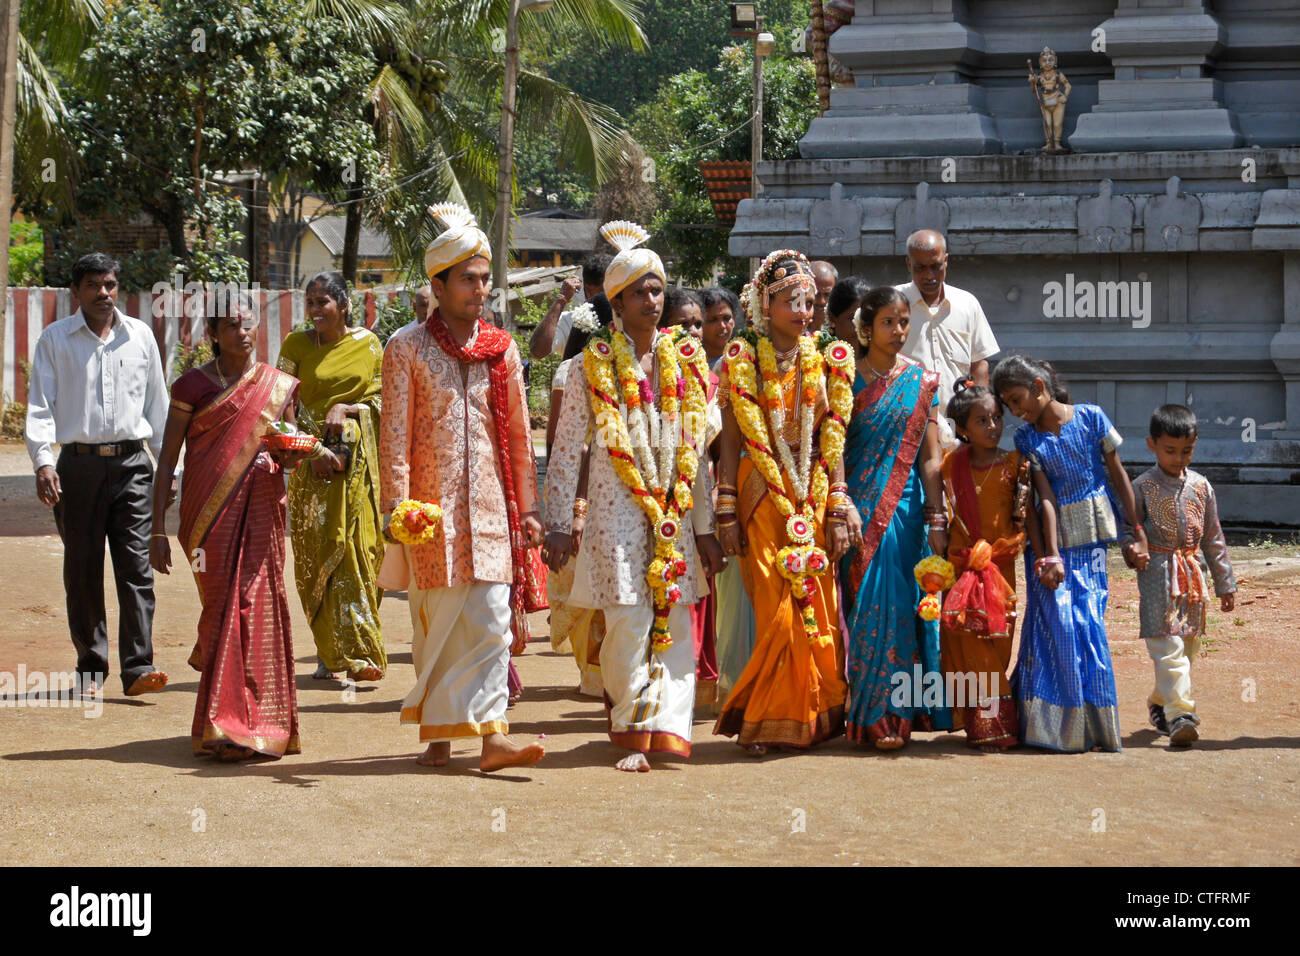 Hindu wedding party at temple matale sri lanka stock for Wedding party dresses in sri lanka